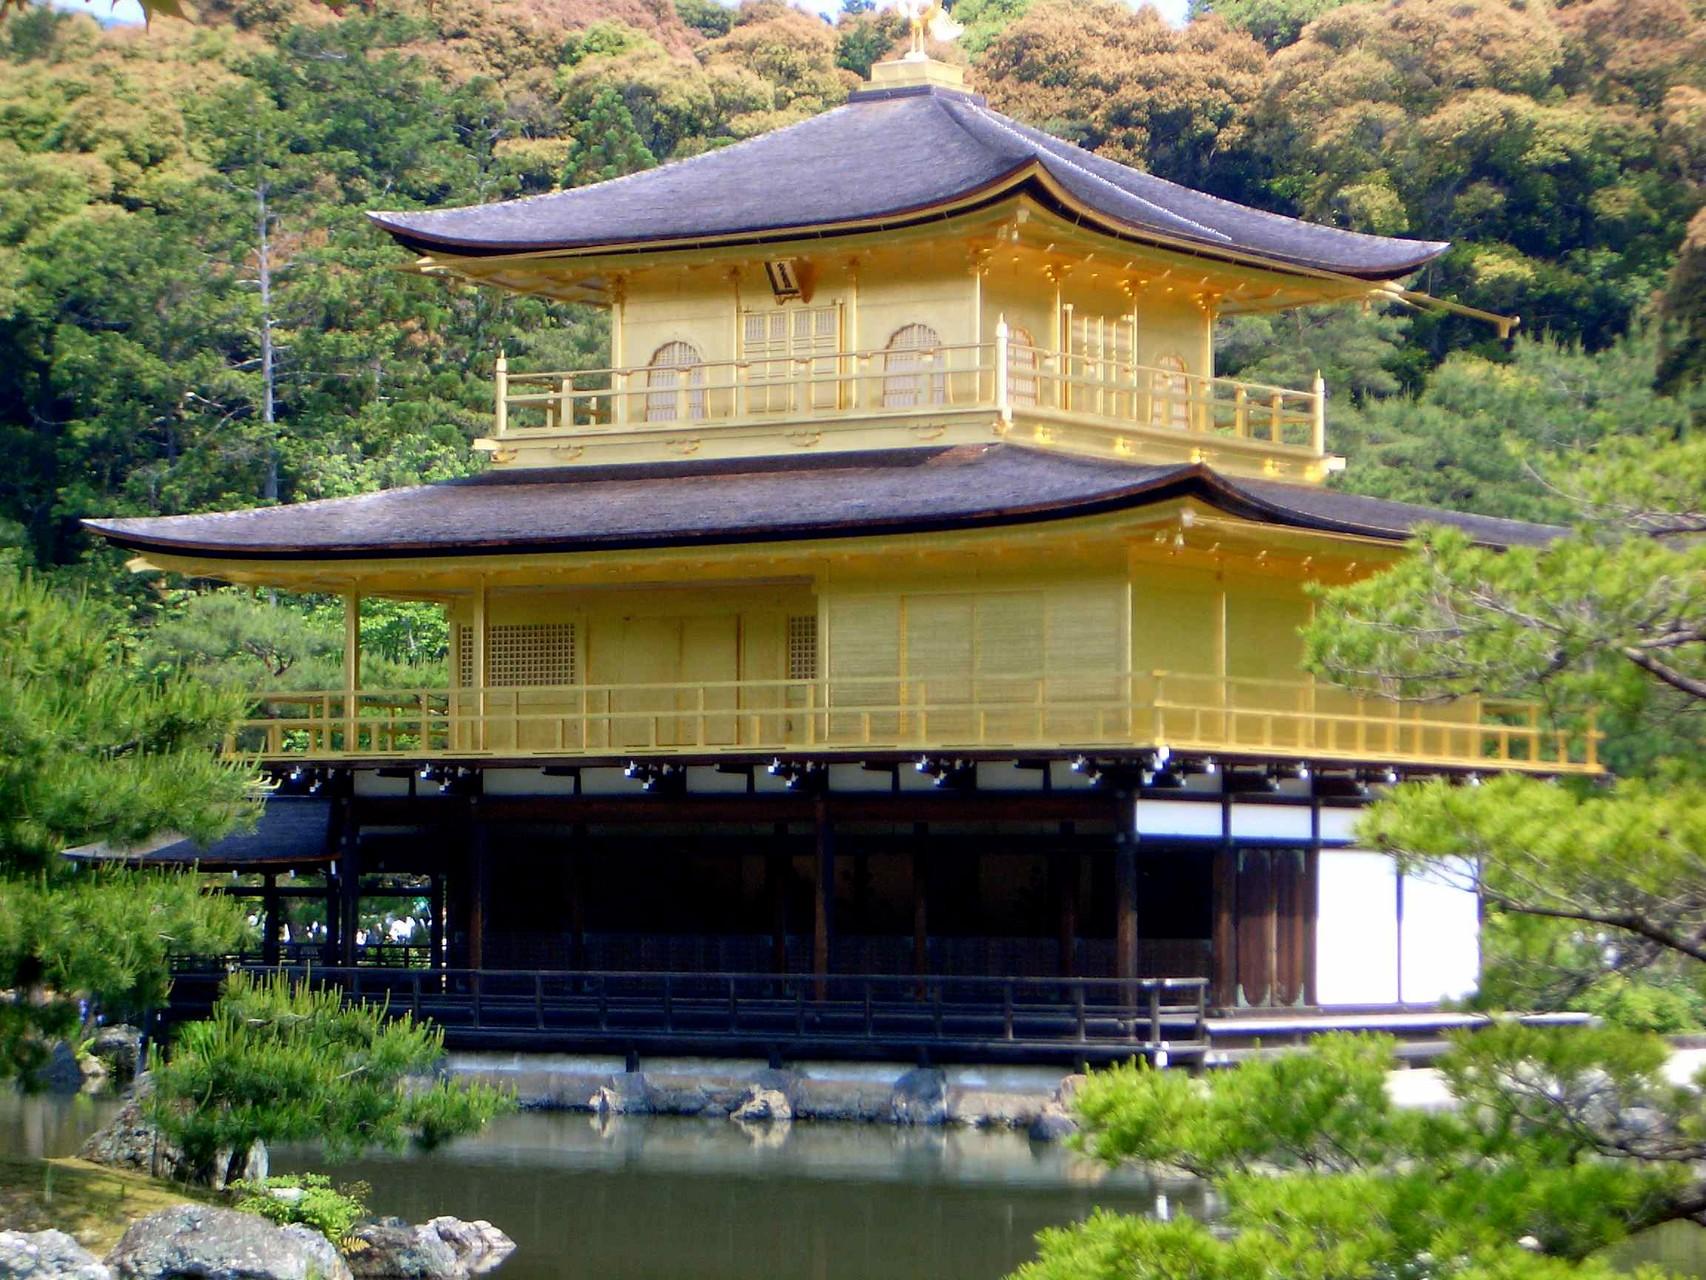 24 carat gold,Golden Pavilion